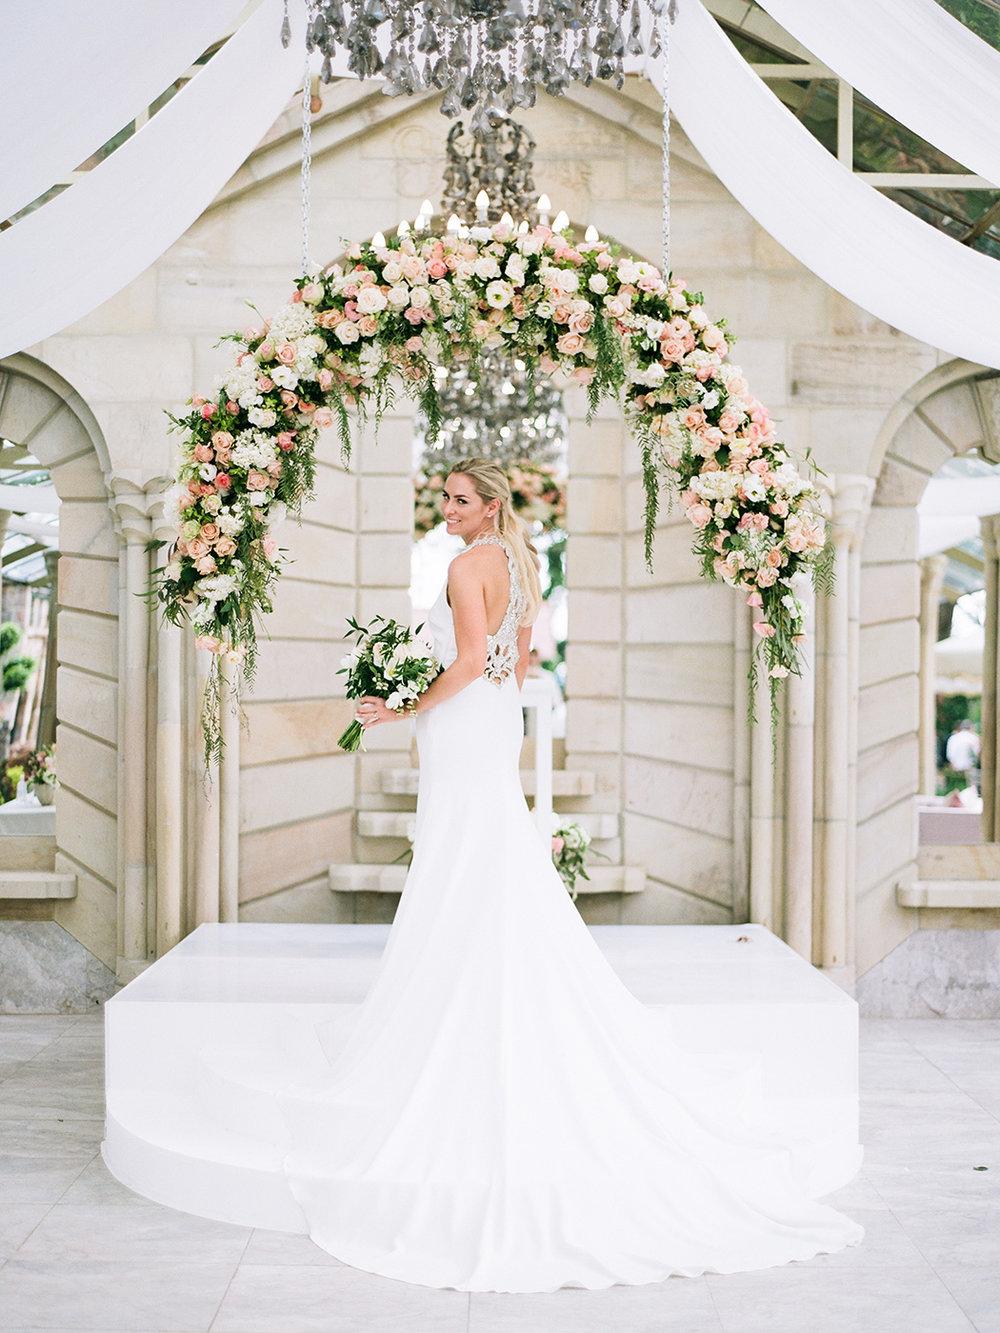 Bride & Floral Arch | Rensche Mari Photography